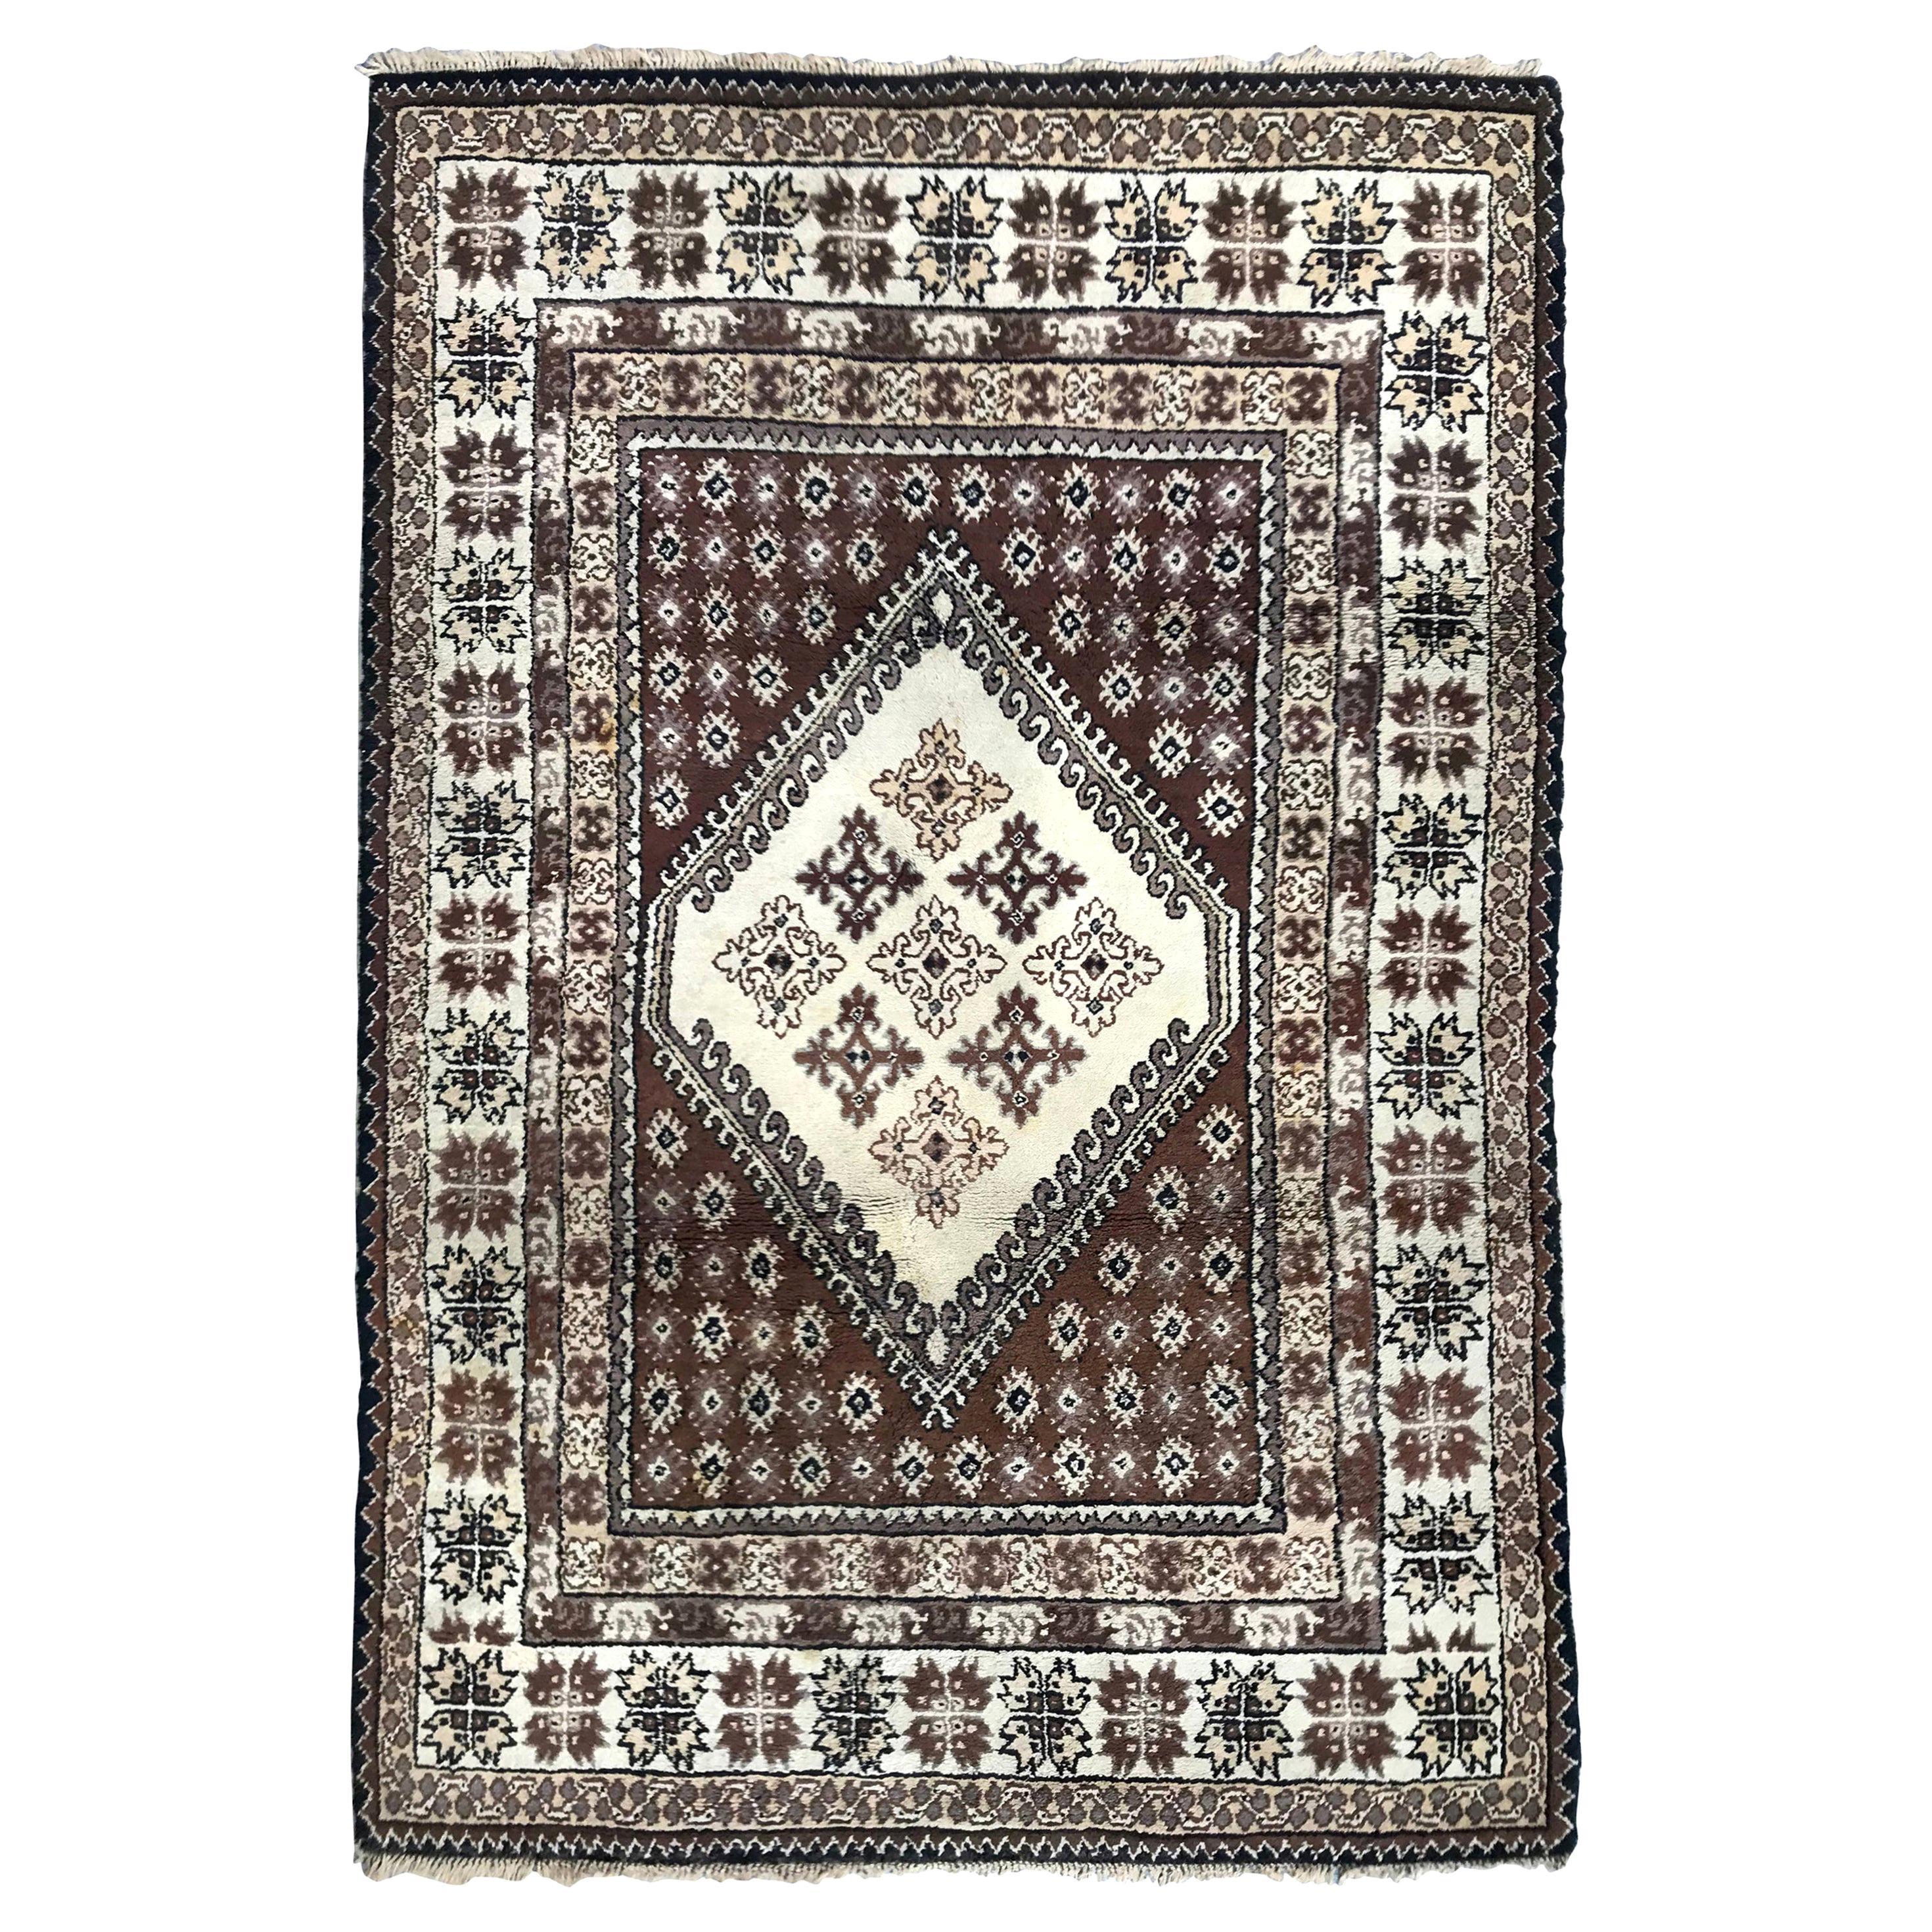 Beautiful Mid-20th Century Tribal Moroccan Rug